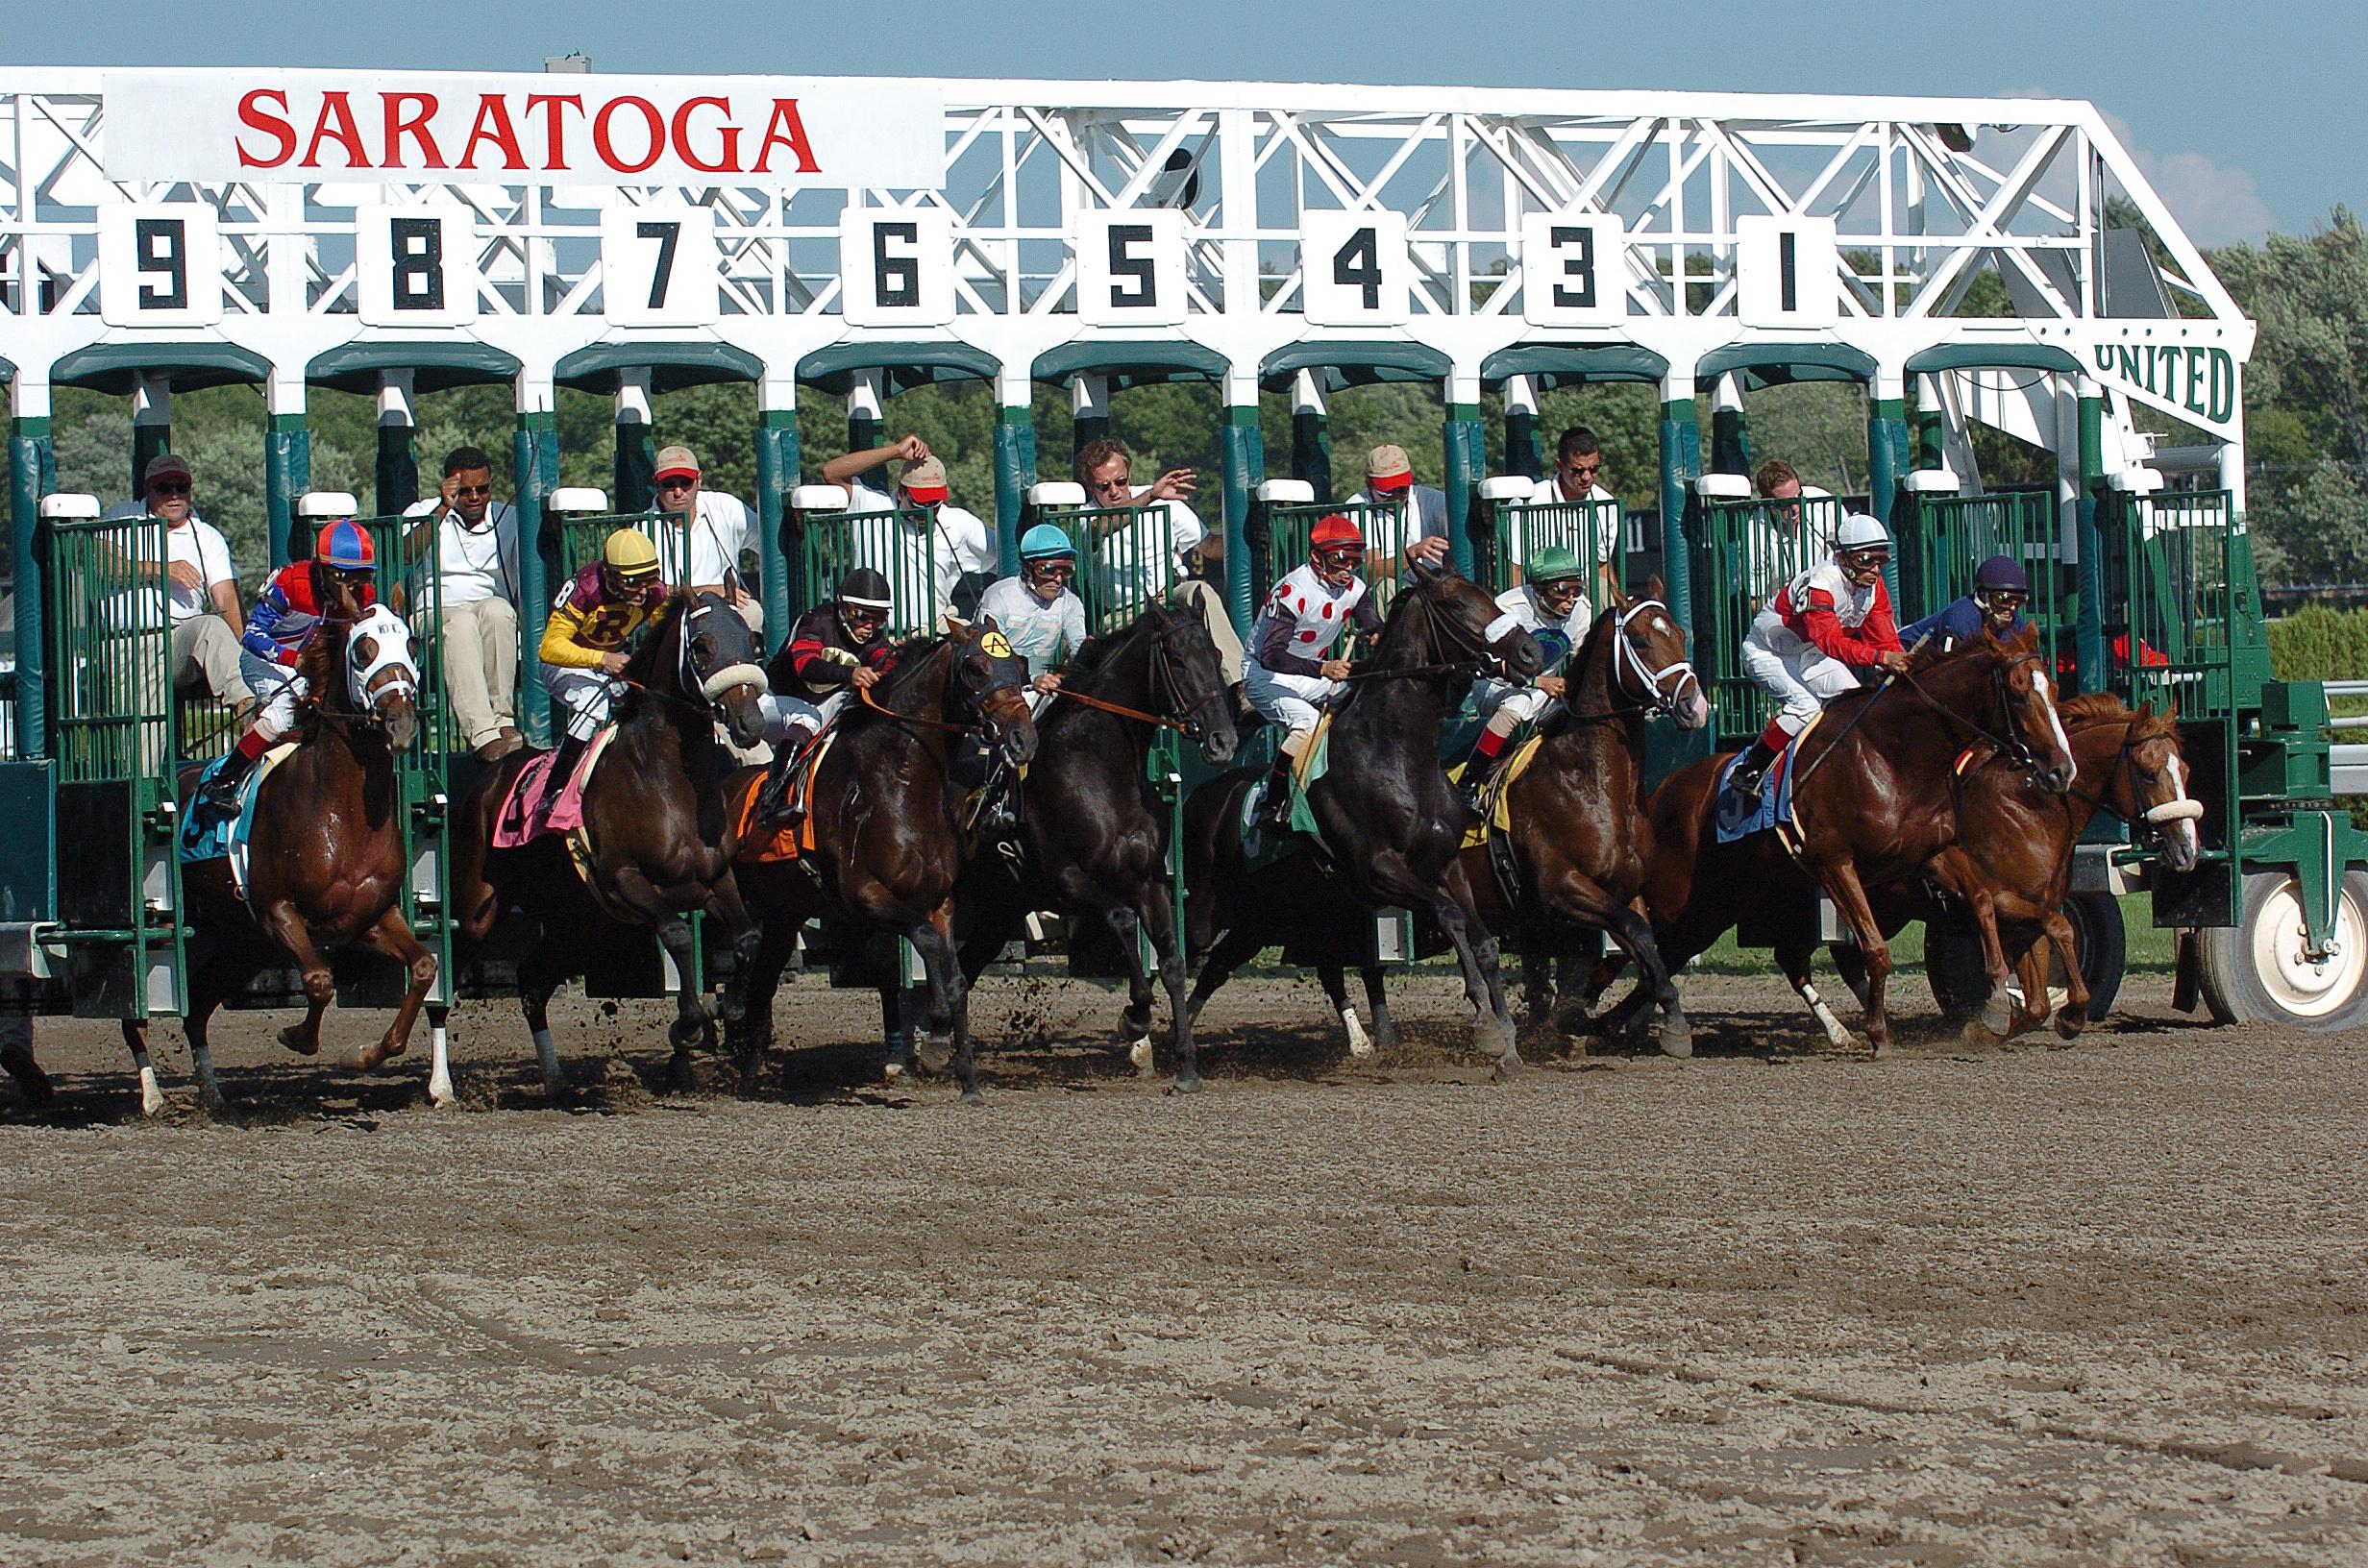 SARATOGA GATE HORSES.jpg